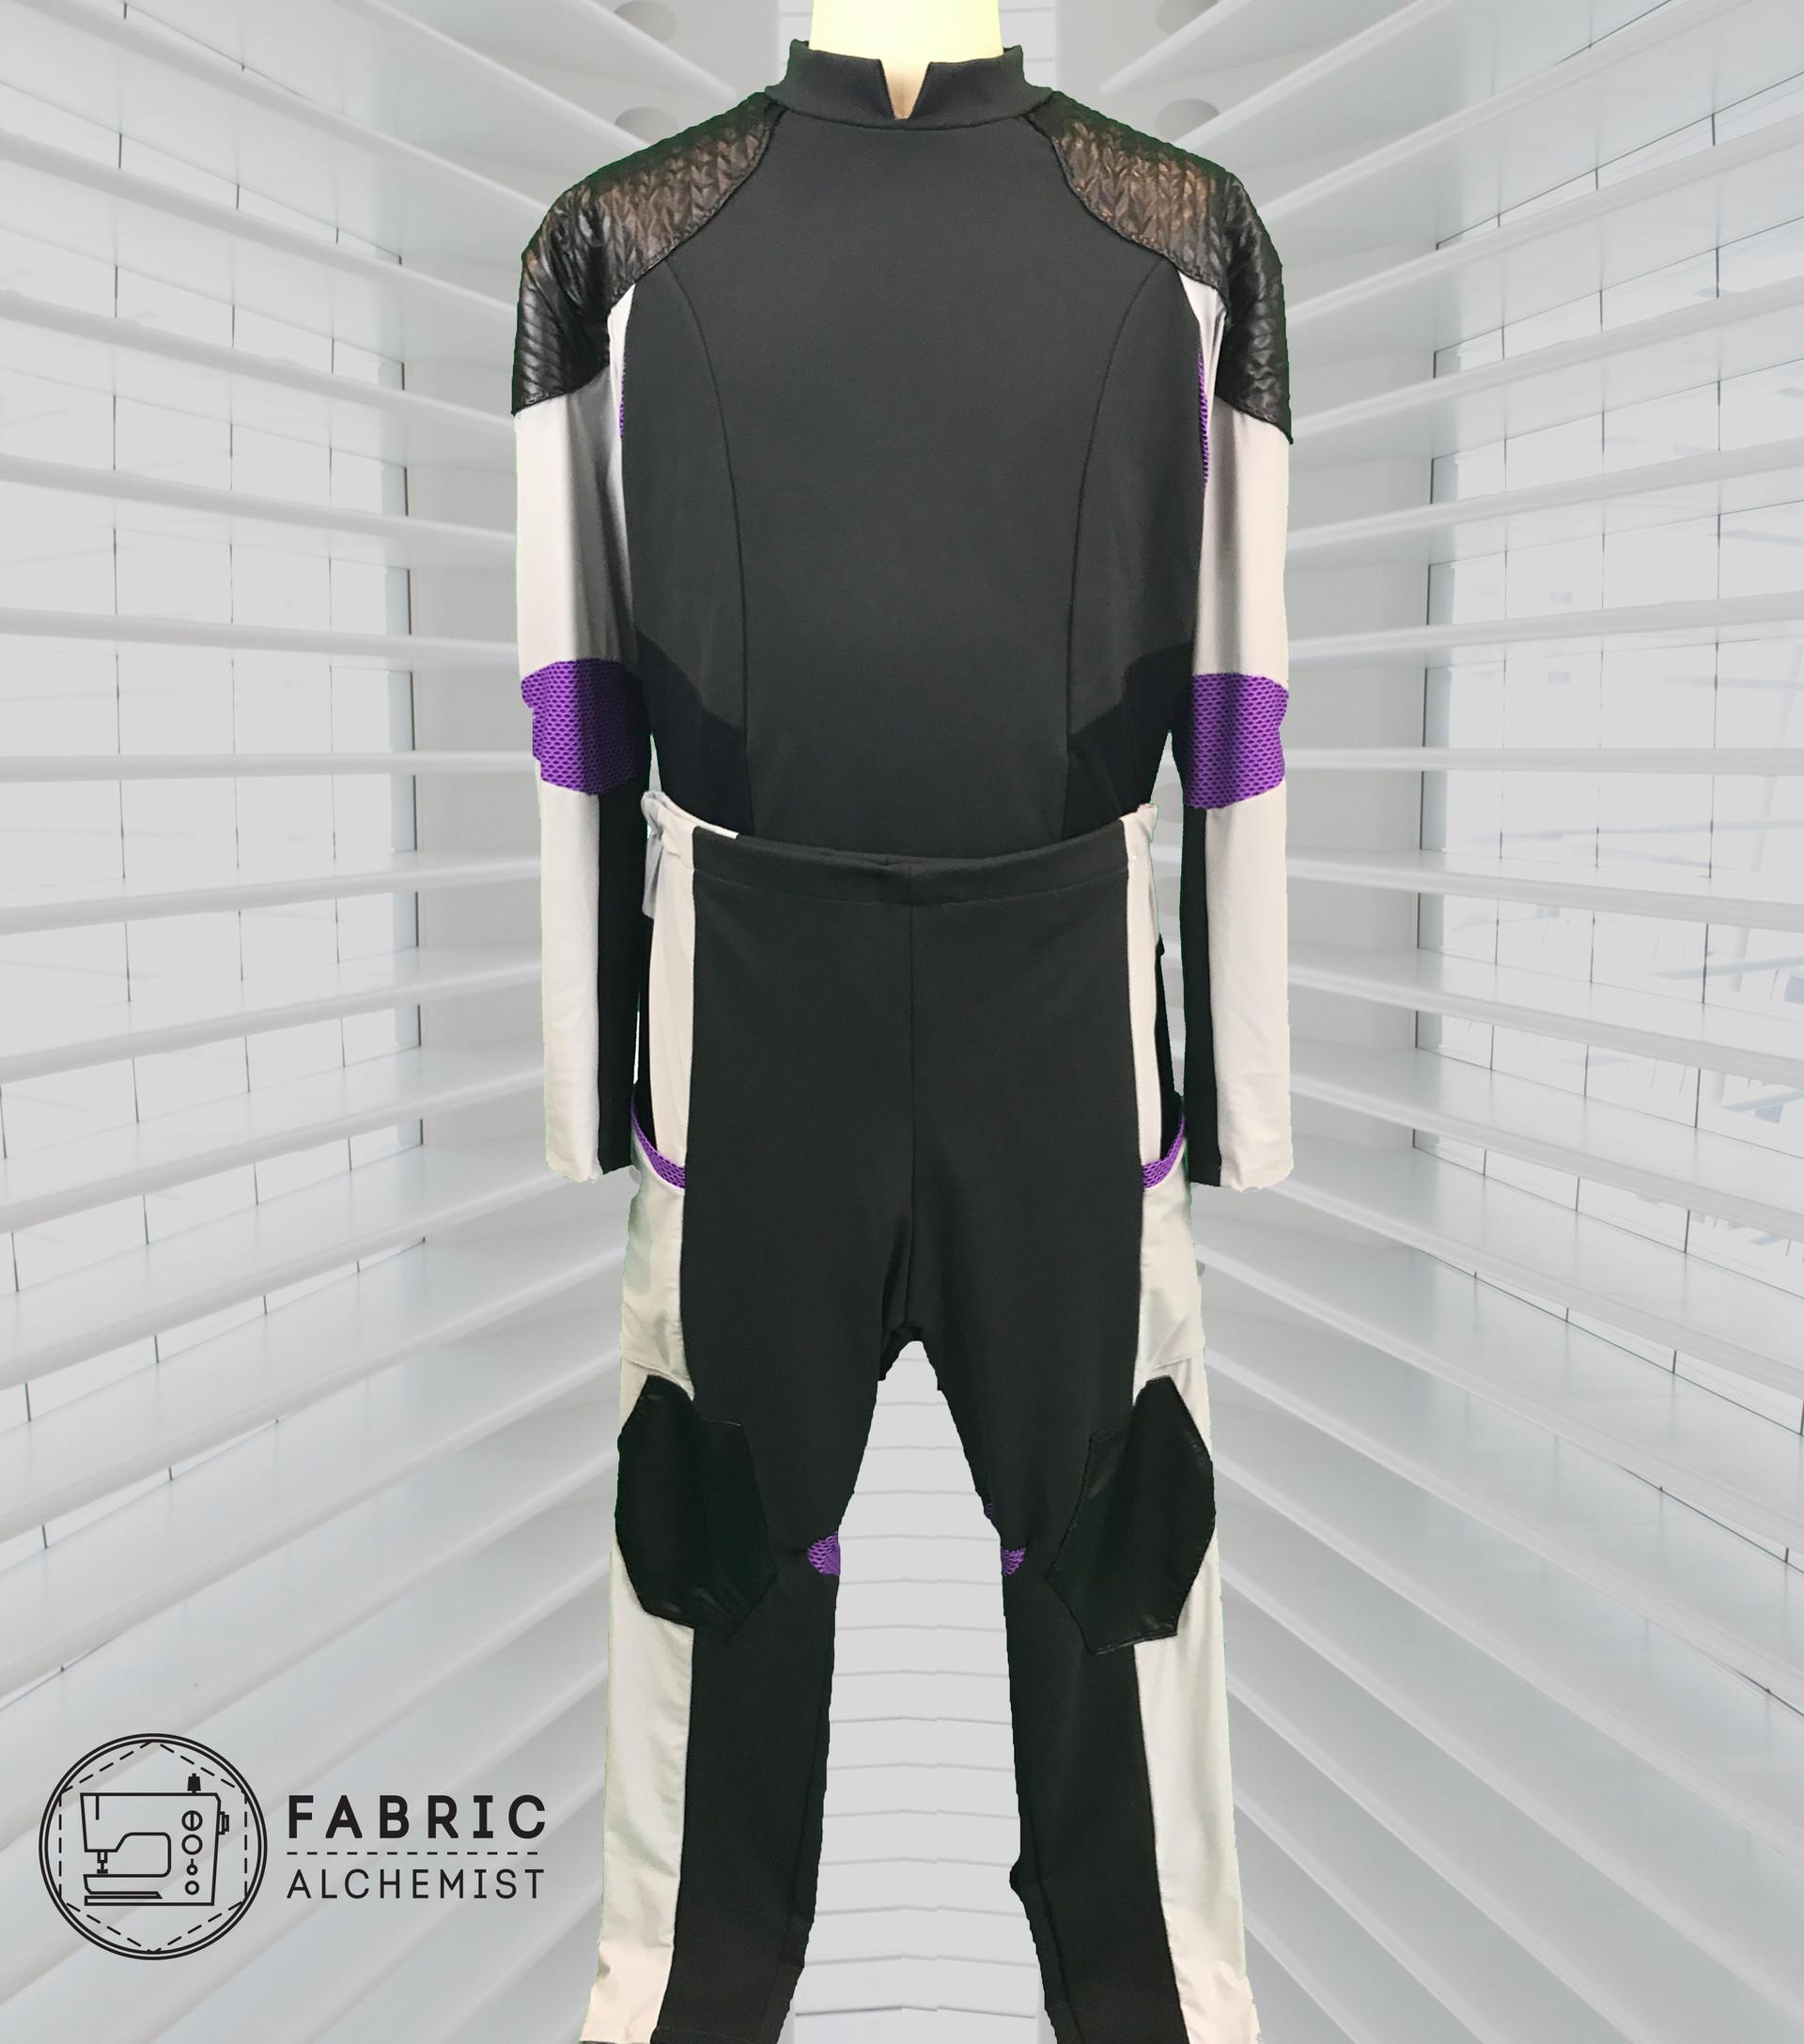 Meris mullaley cosmicashsuit cropped